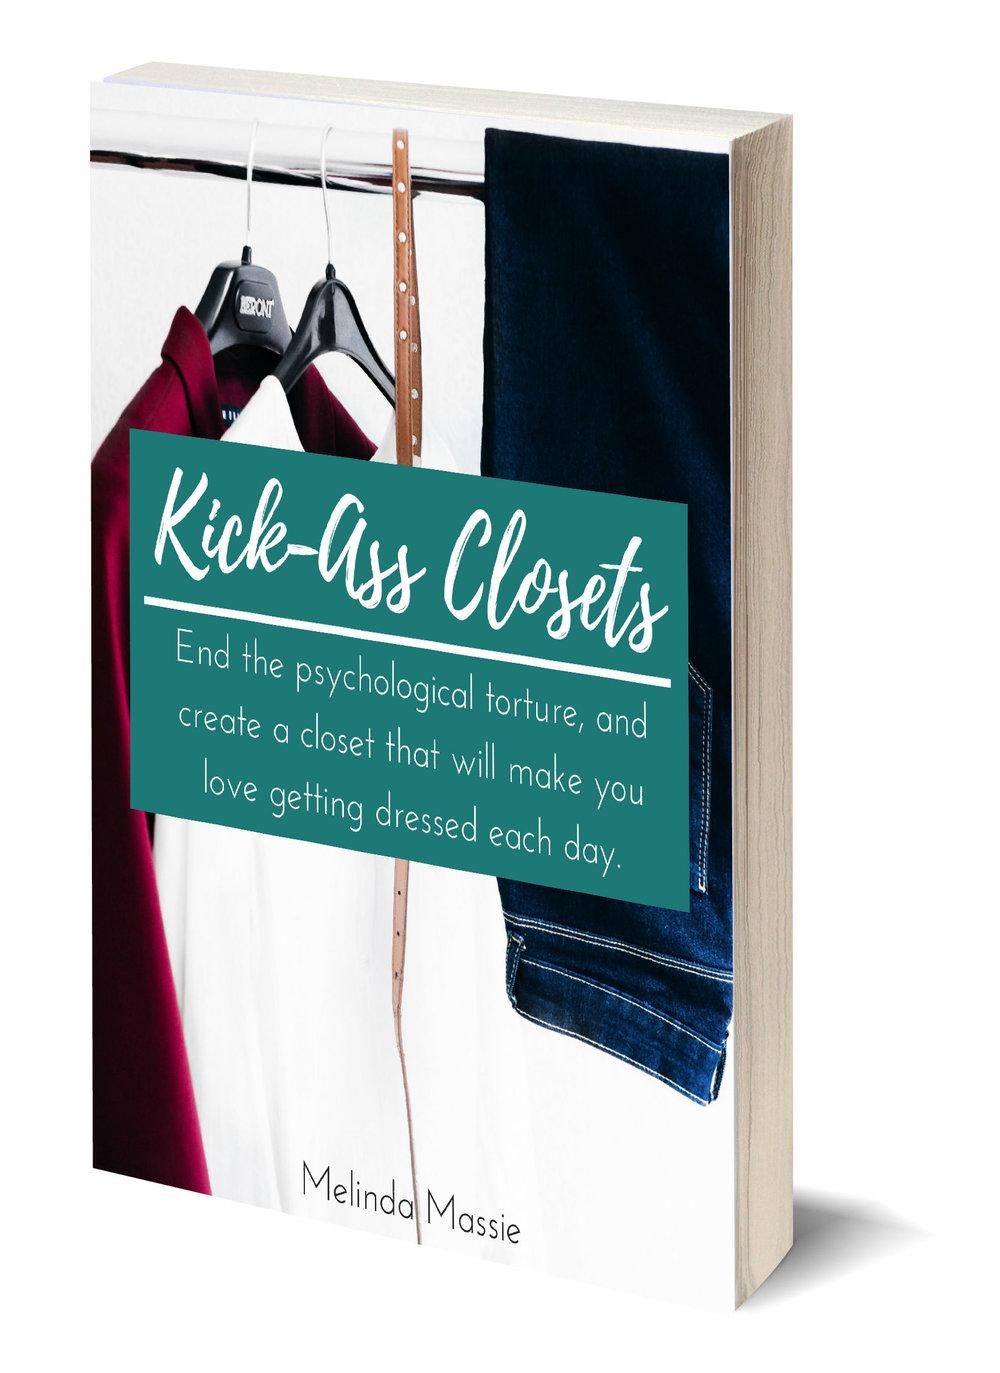 Kick Ass Closets by Melinda Massie